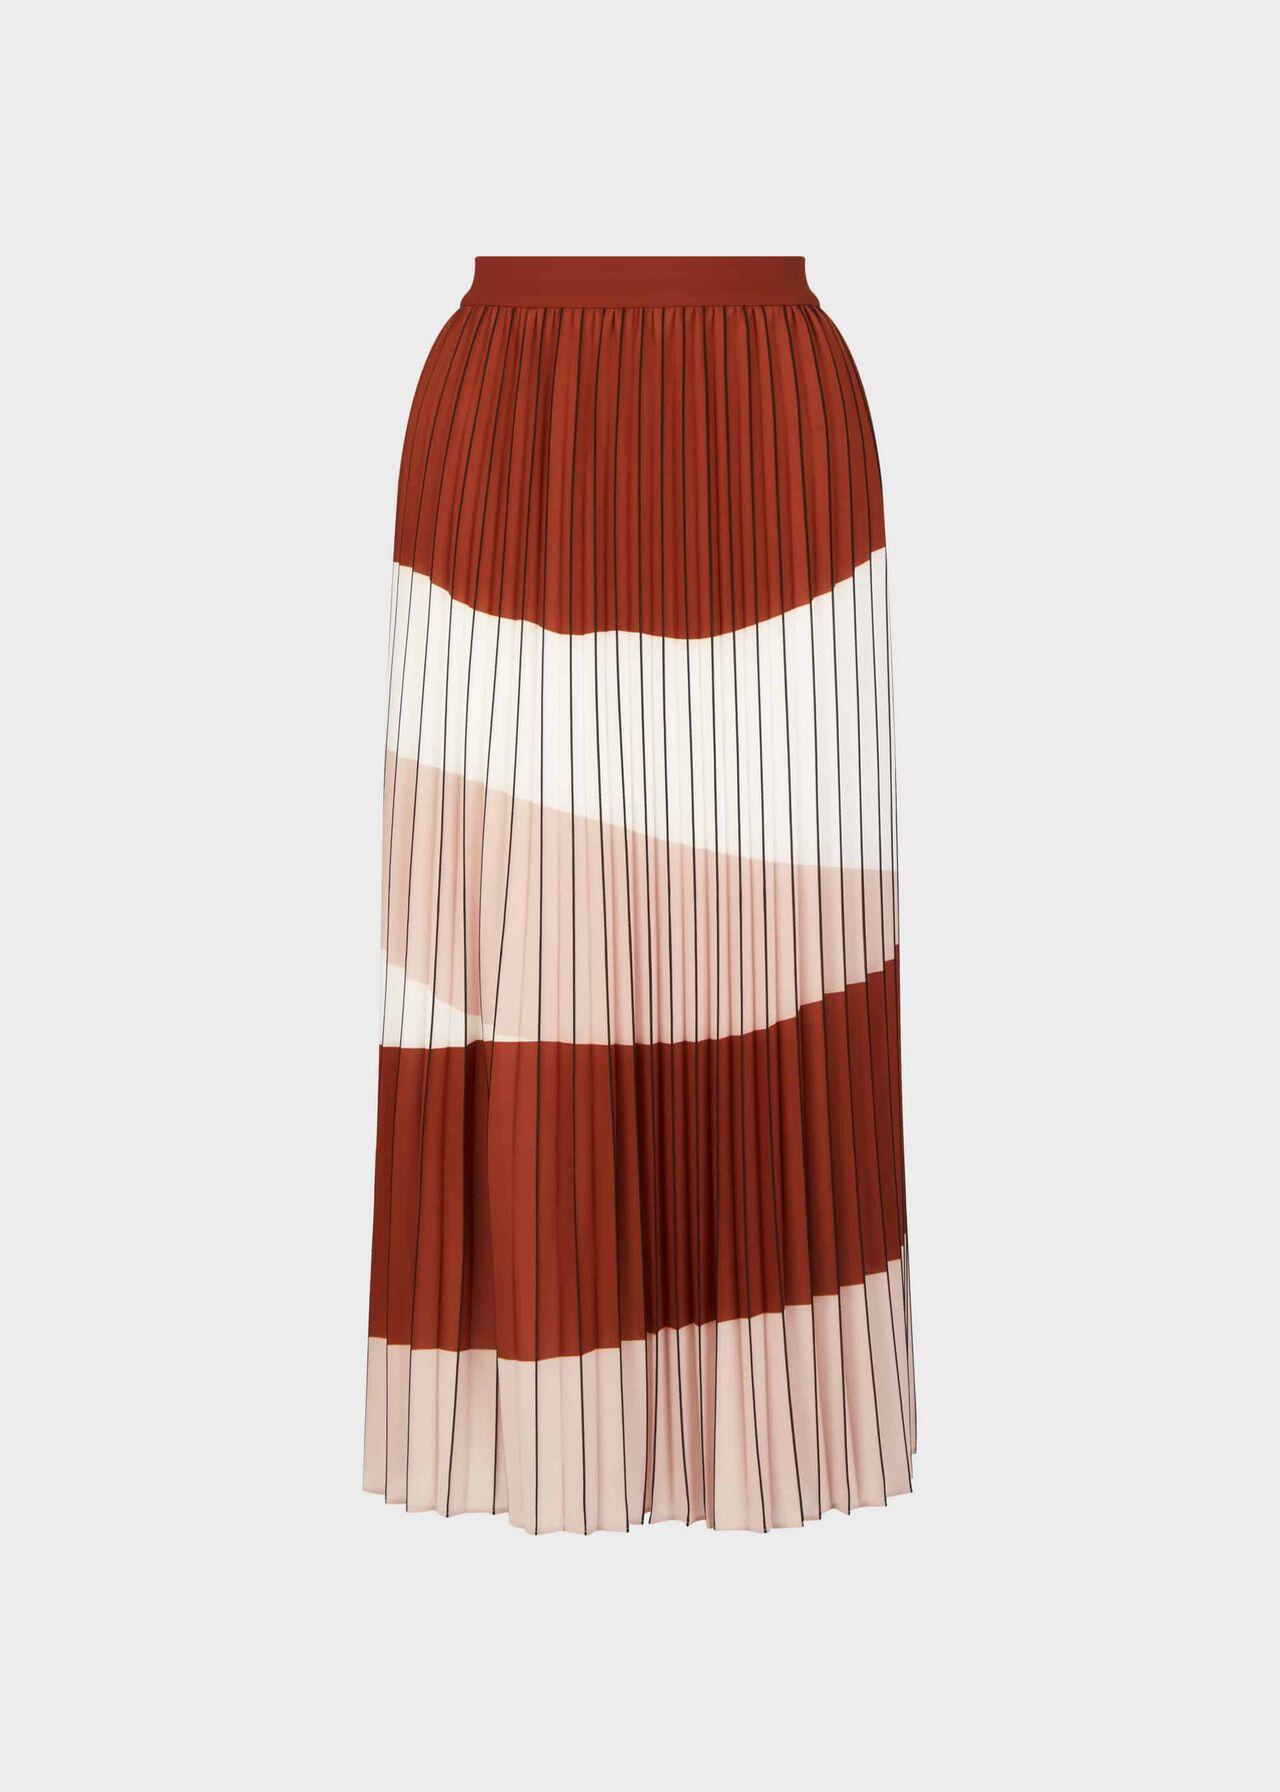 Bess Stripe Midi Skirt Ivory Rust